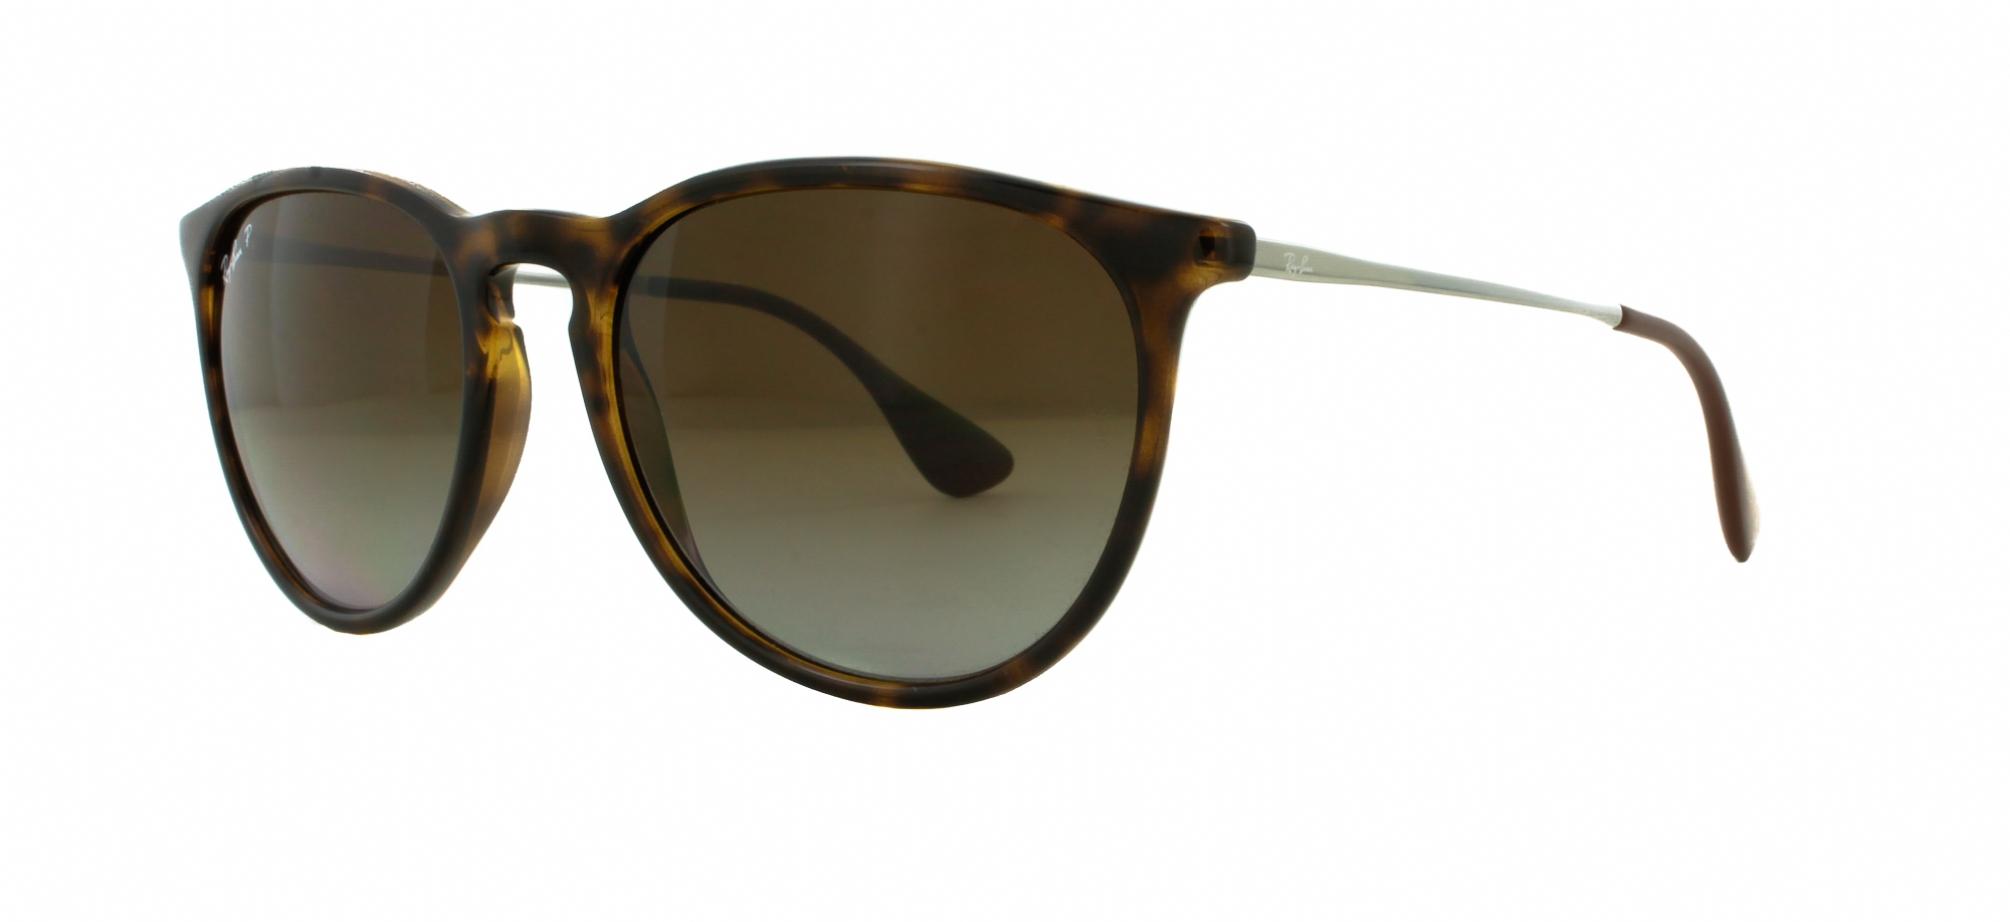 ray ban 4171 sunglasses. Black Bedroom Furniture Sets. Home Design Ideas